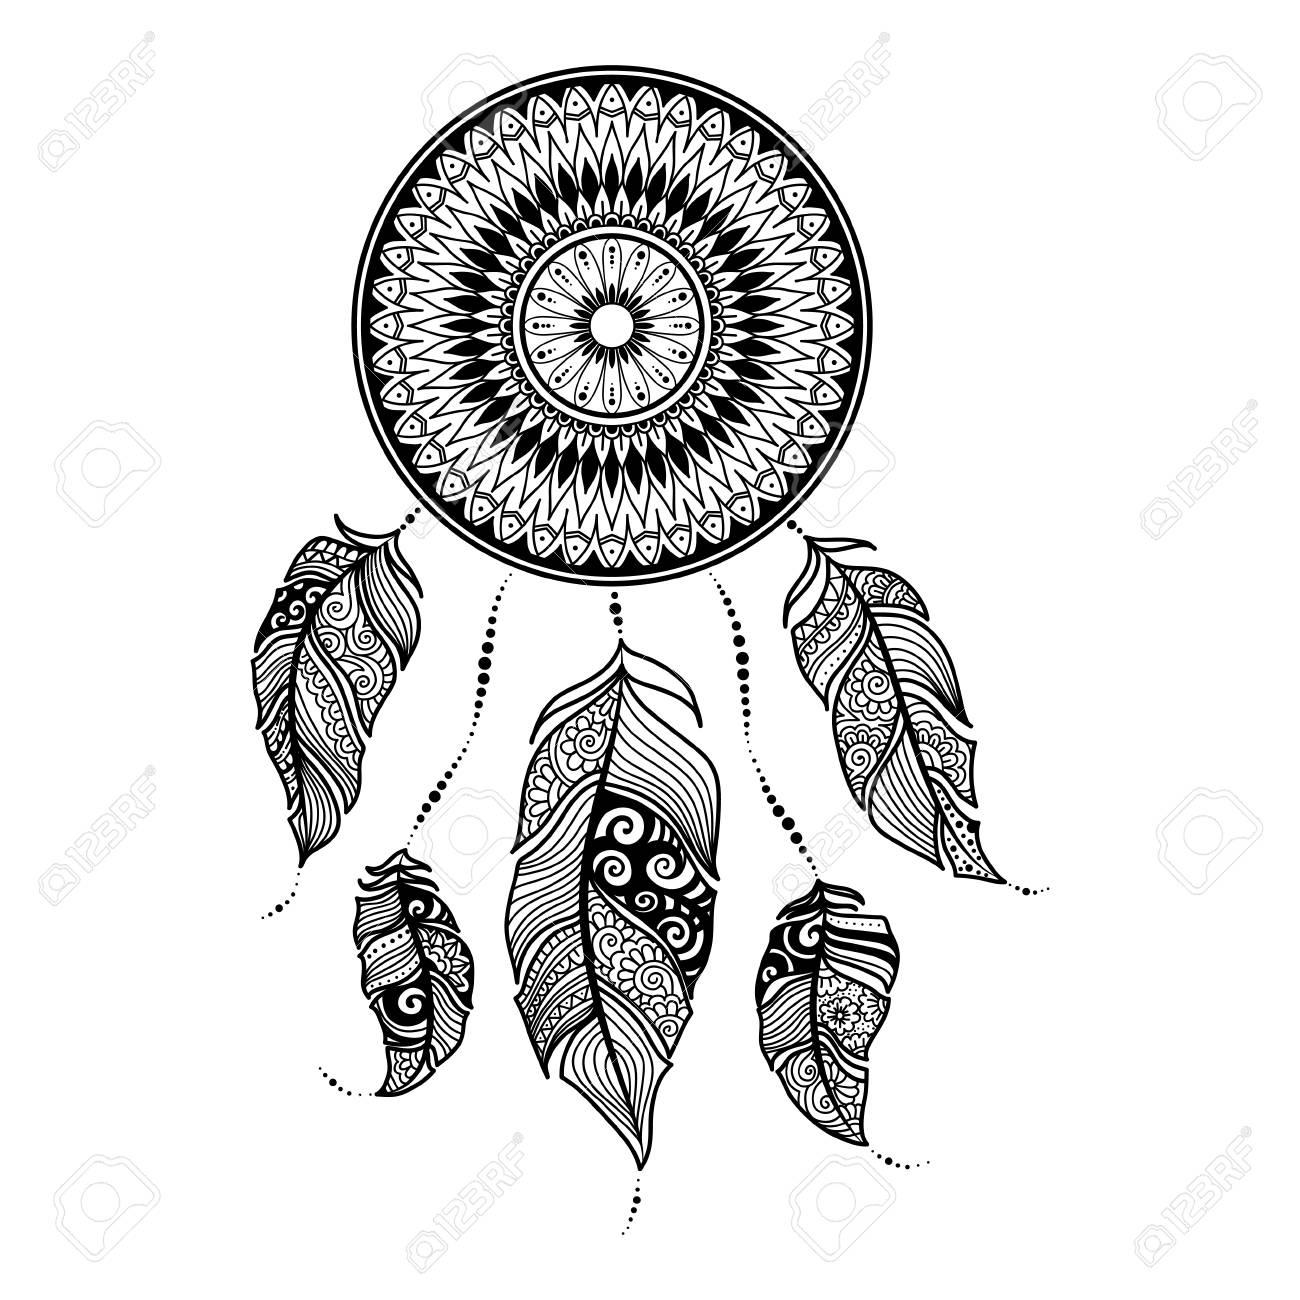 Ilustración Vectorial Atrapasueños Con Plumas étnicas Pintado A